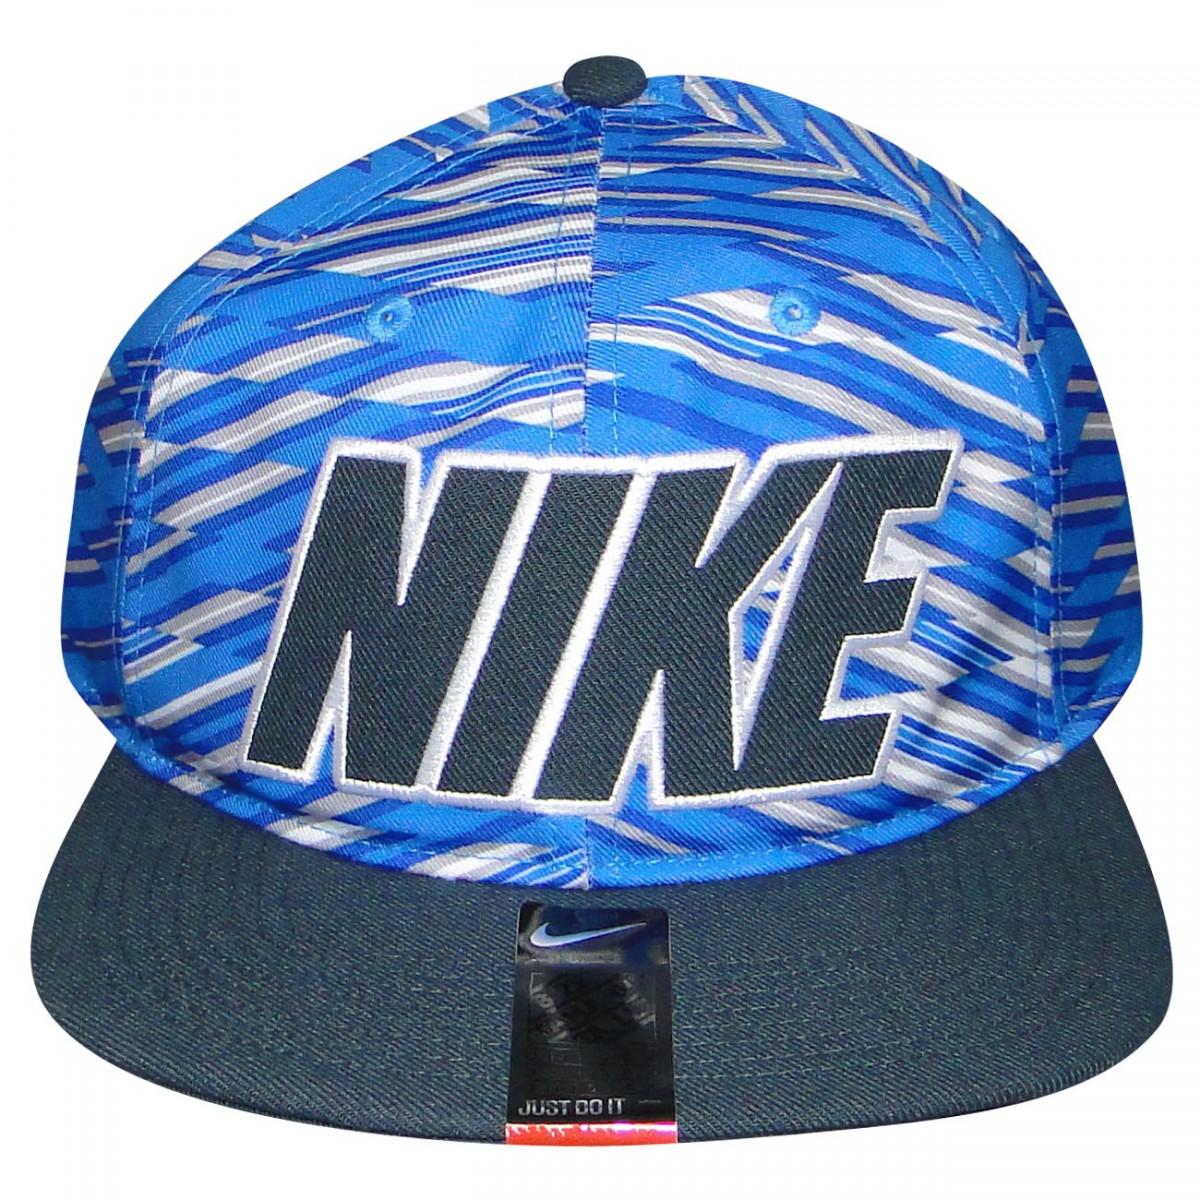 Bone Nike 666412 666412-435 - Azul Branco Preto - Chuteira Nike ... cae753782fc